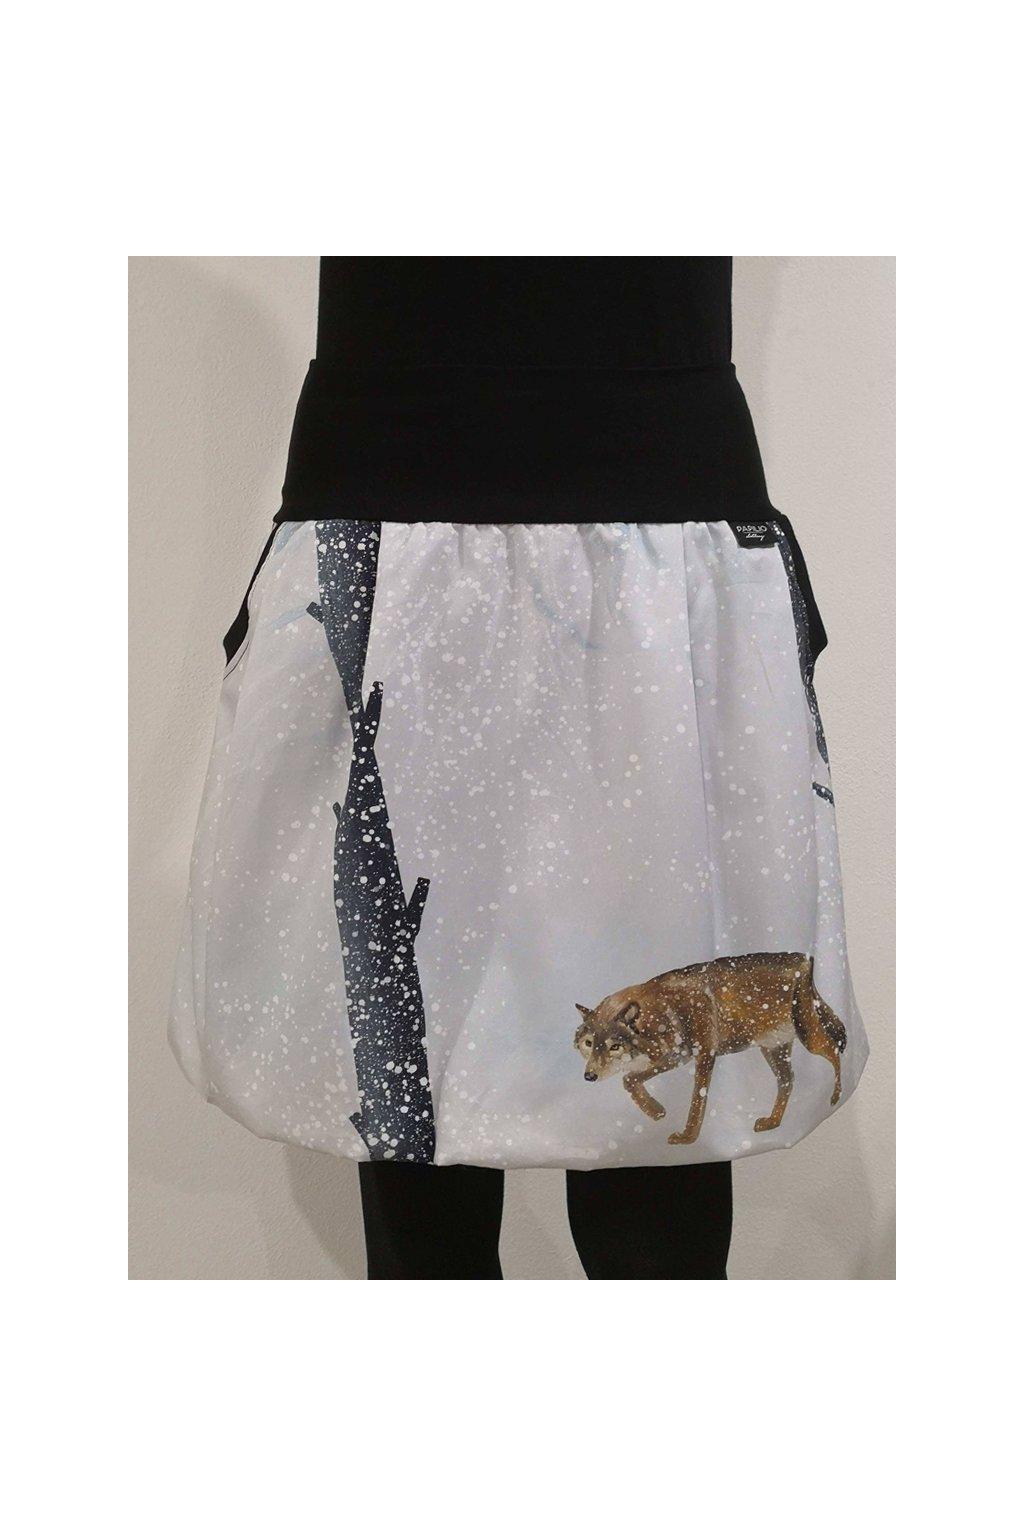 balonova sukne na vlci stezce papilio clothing